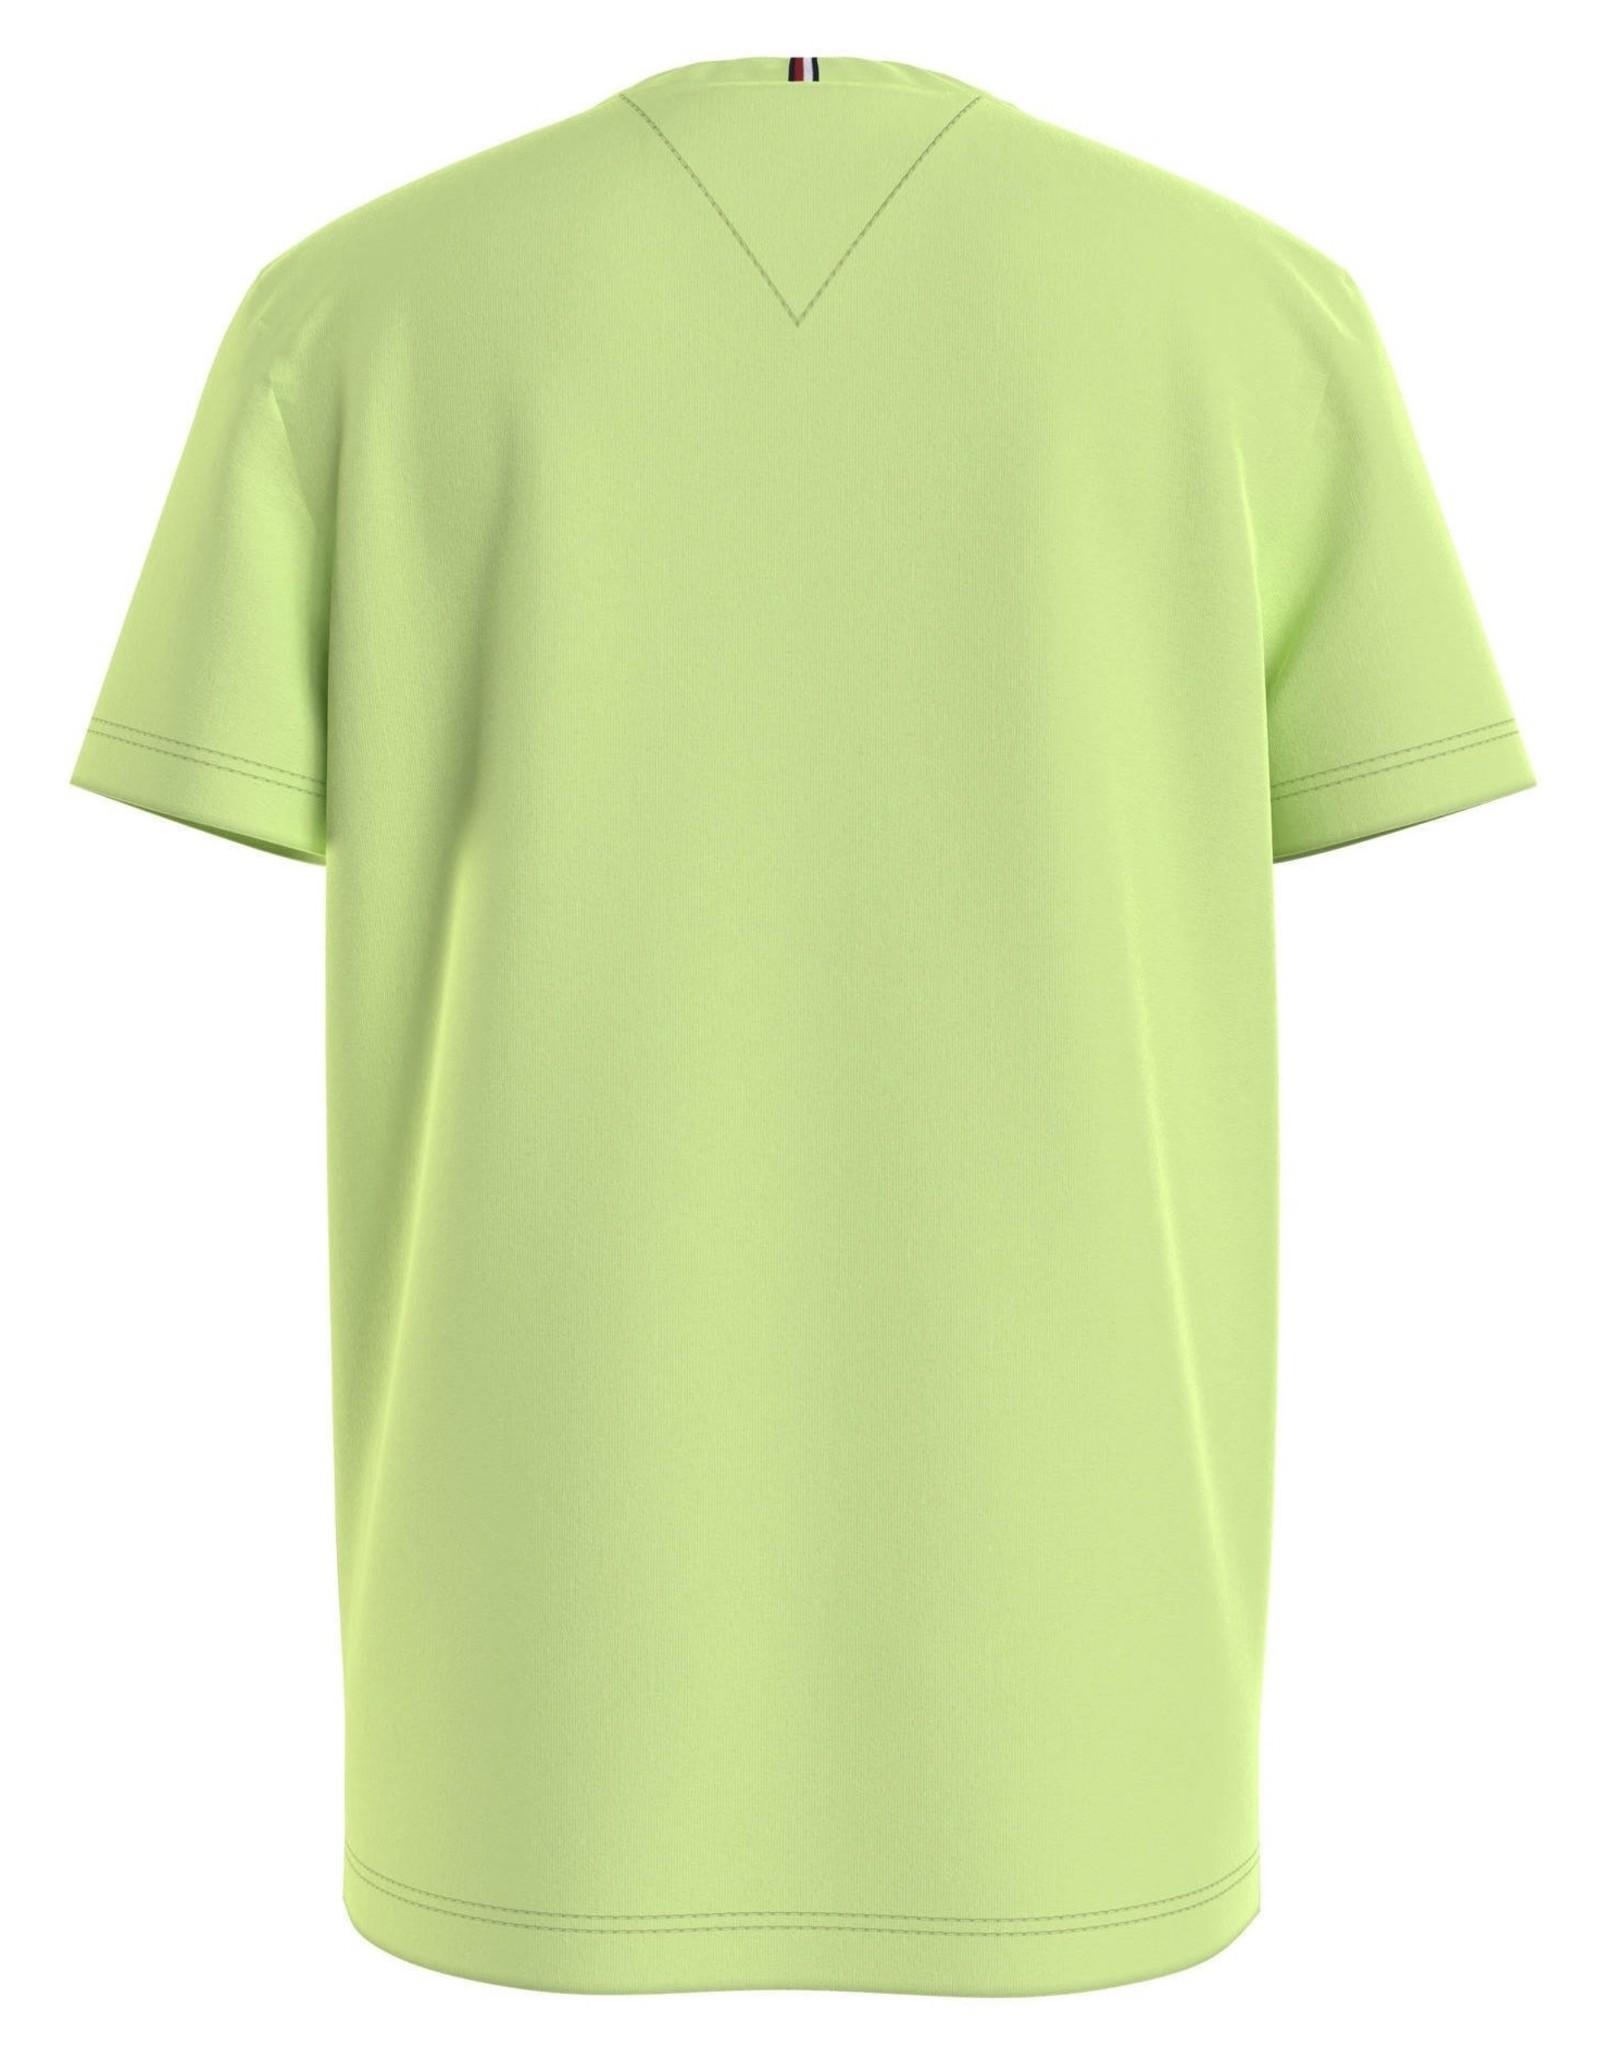 Tommy Hilfiger 6130 T-Shirt